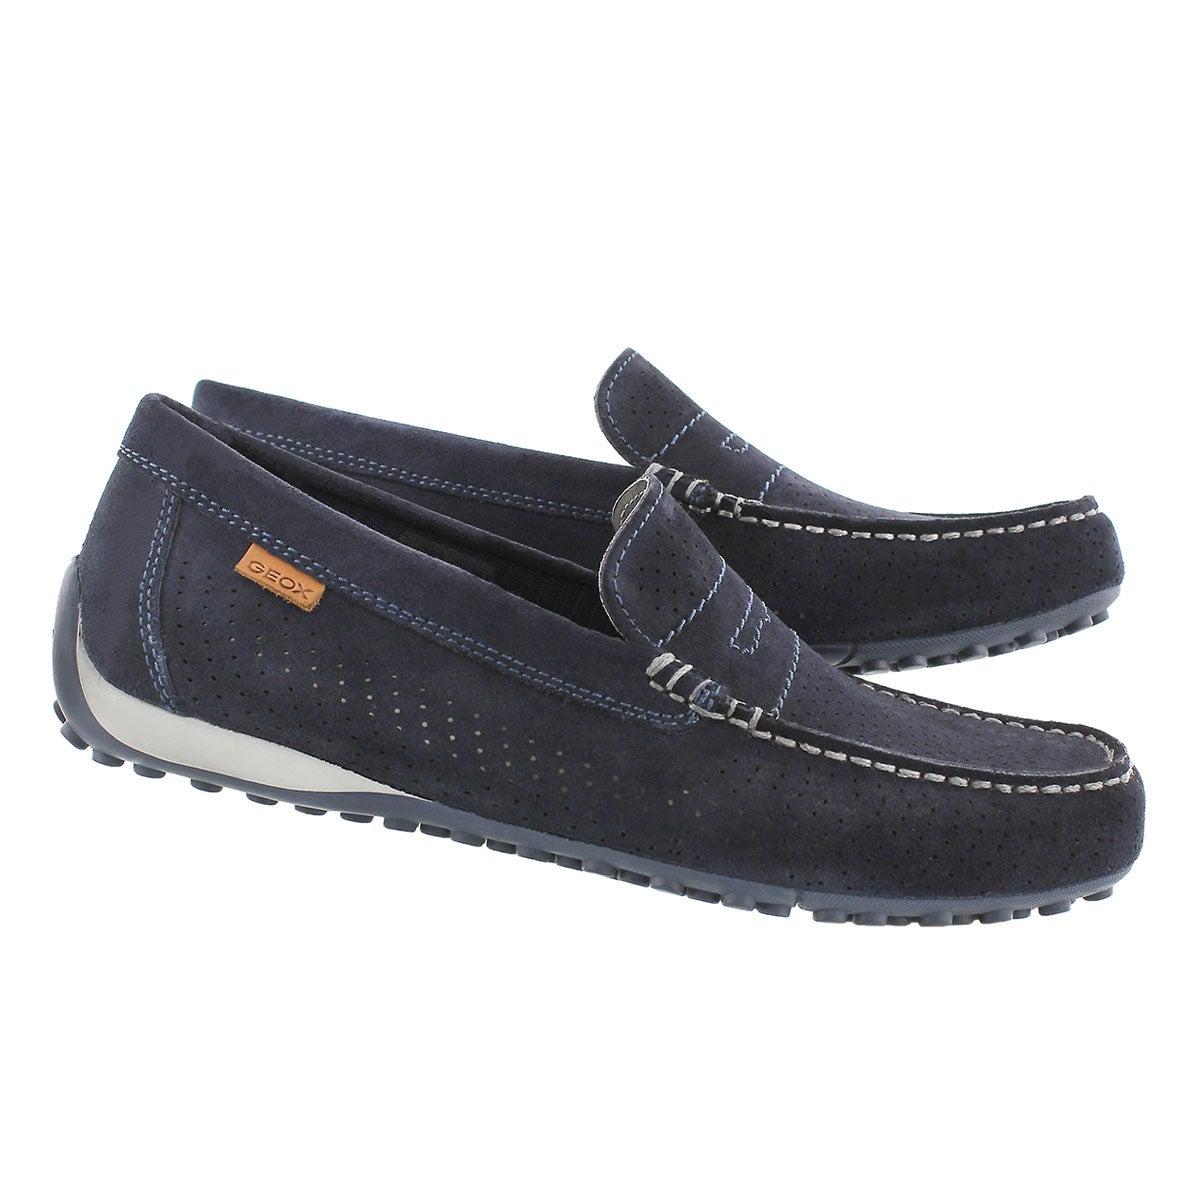 Mns Snake Moc 2Fit navy loafer